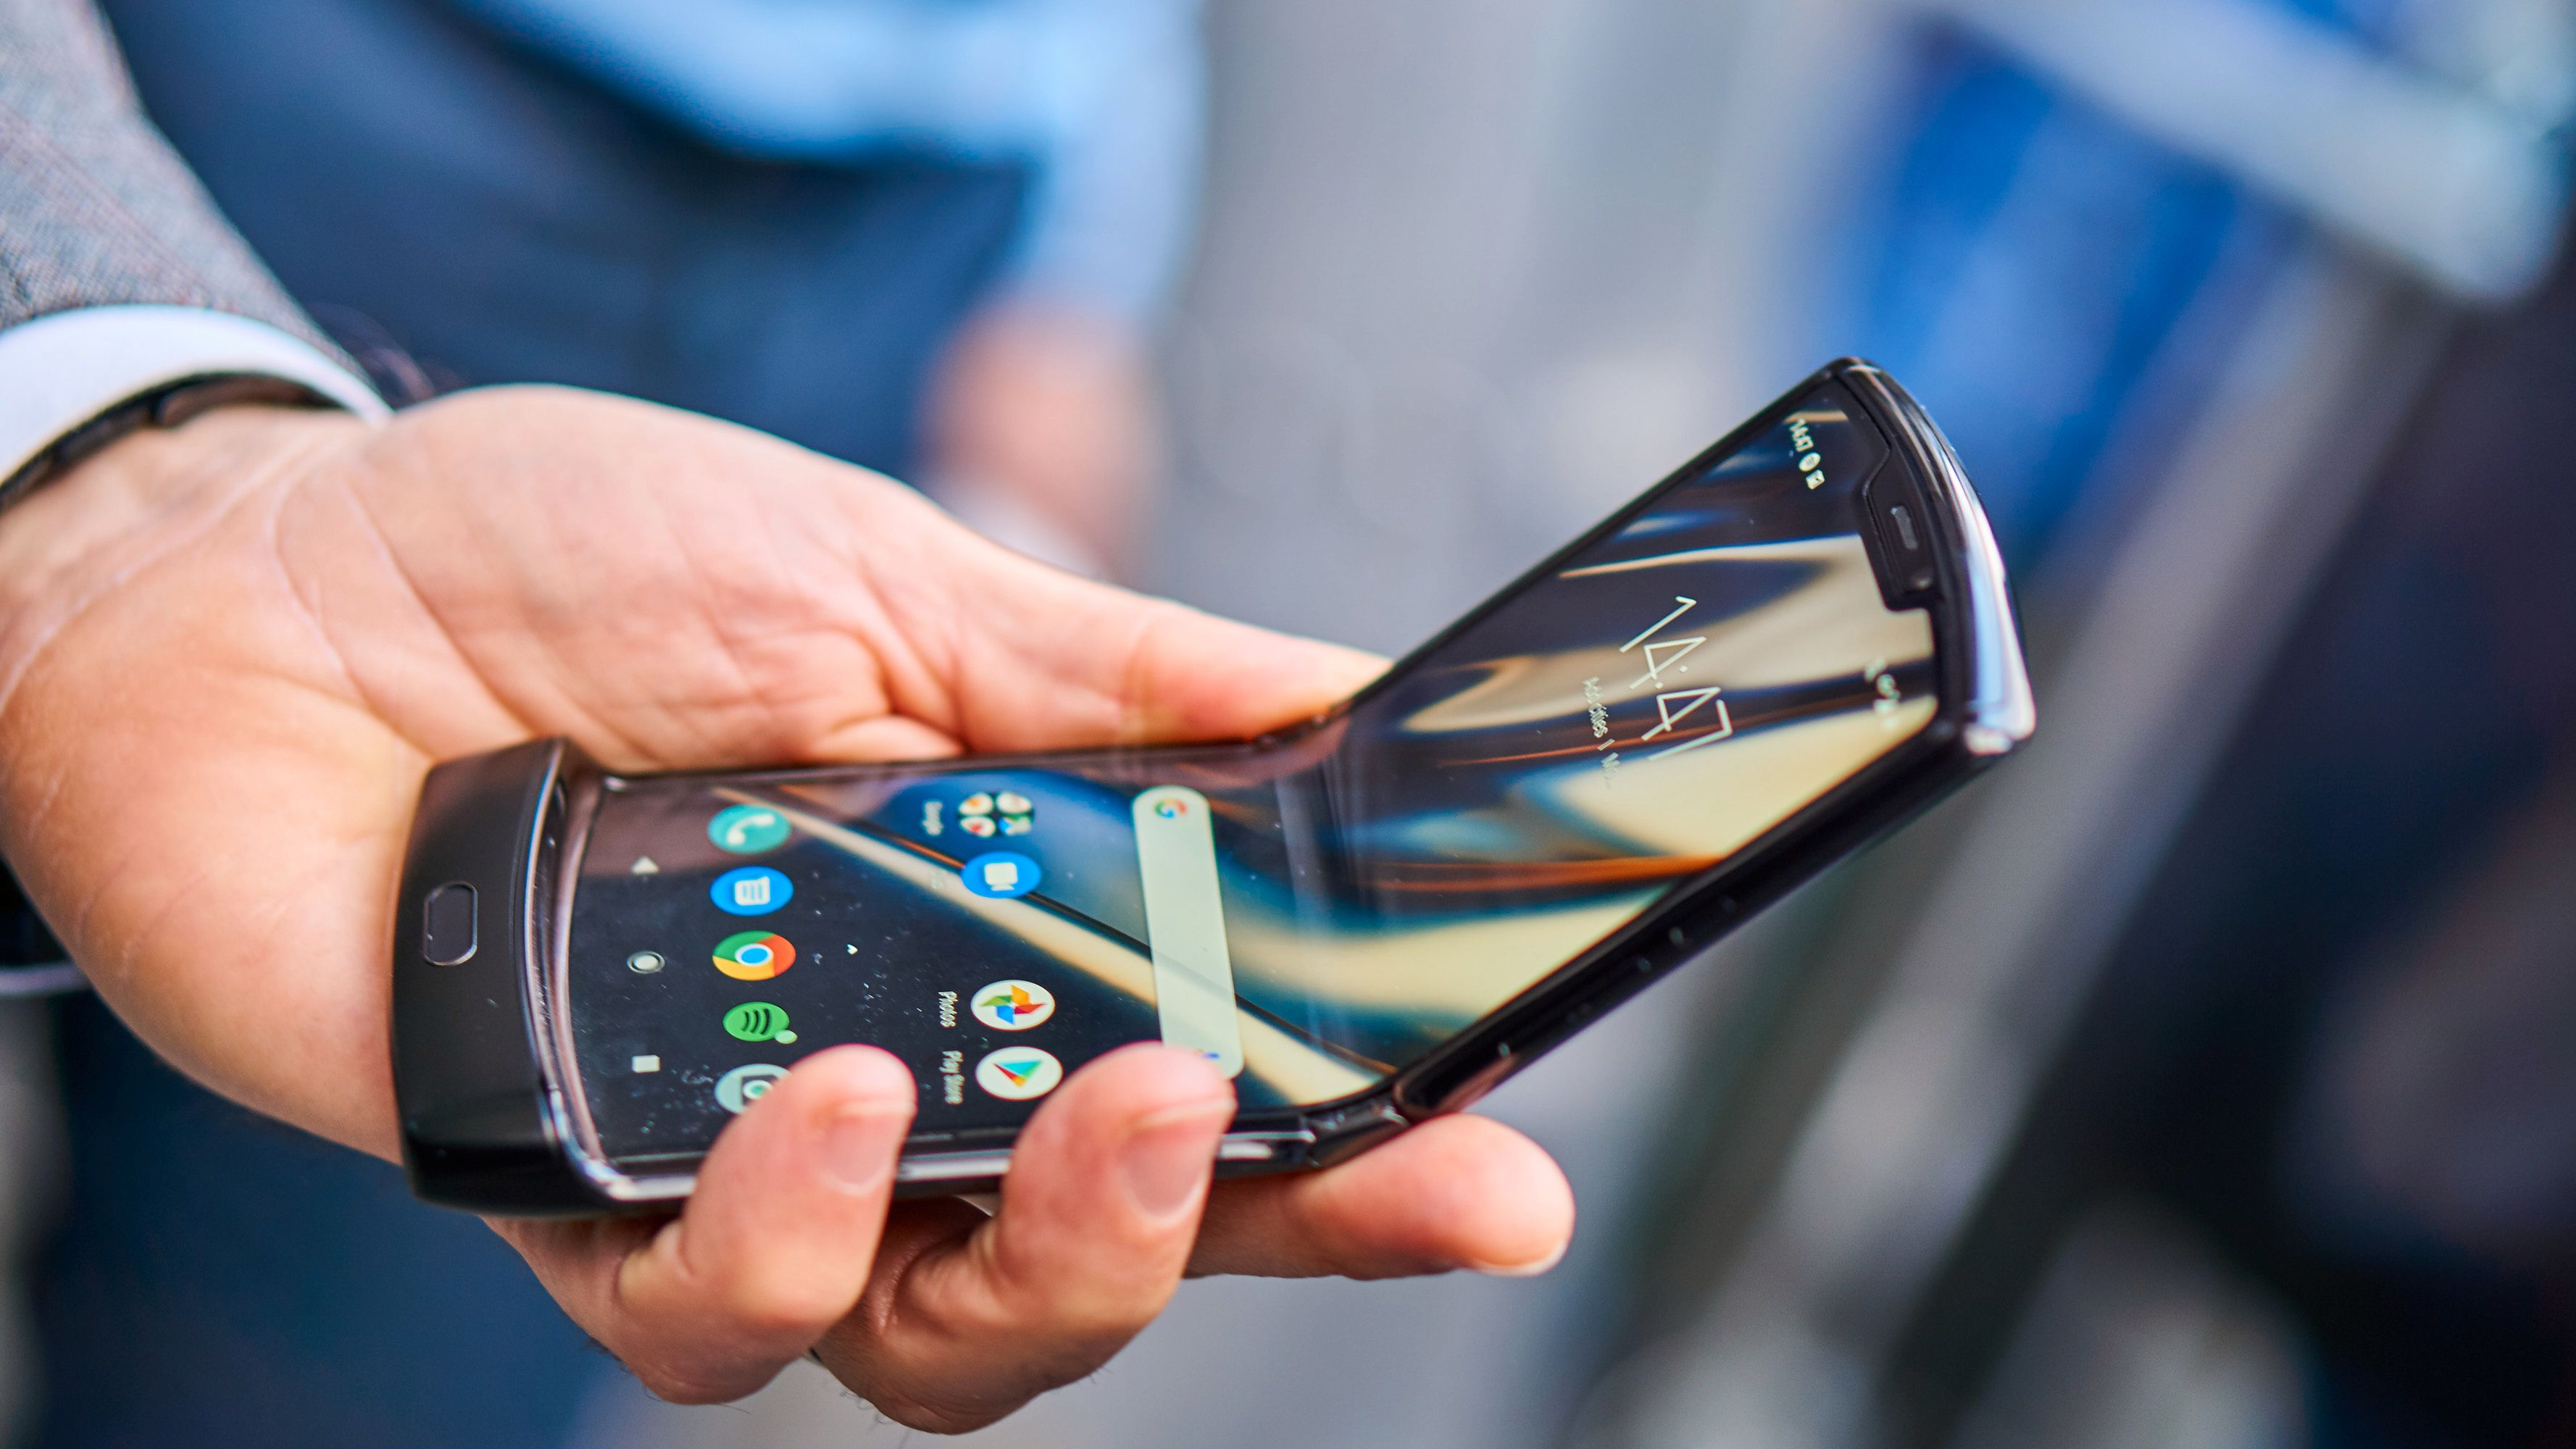 Motorola Razr i halvveis utbøyd tilstand.